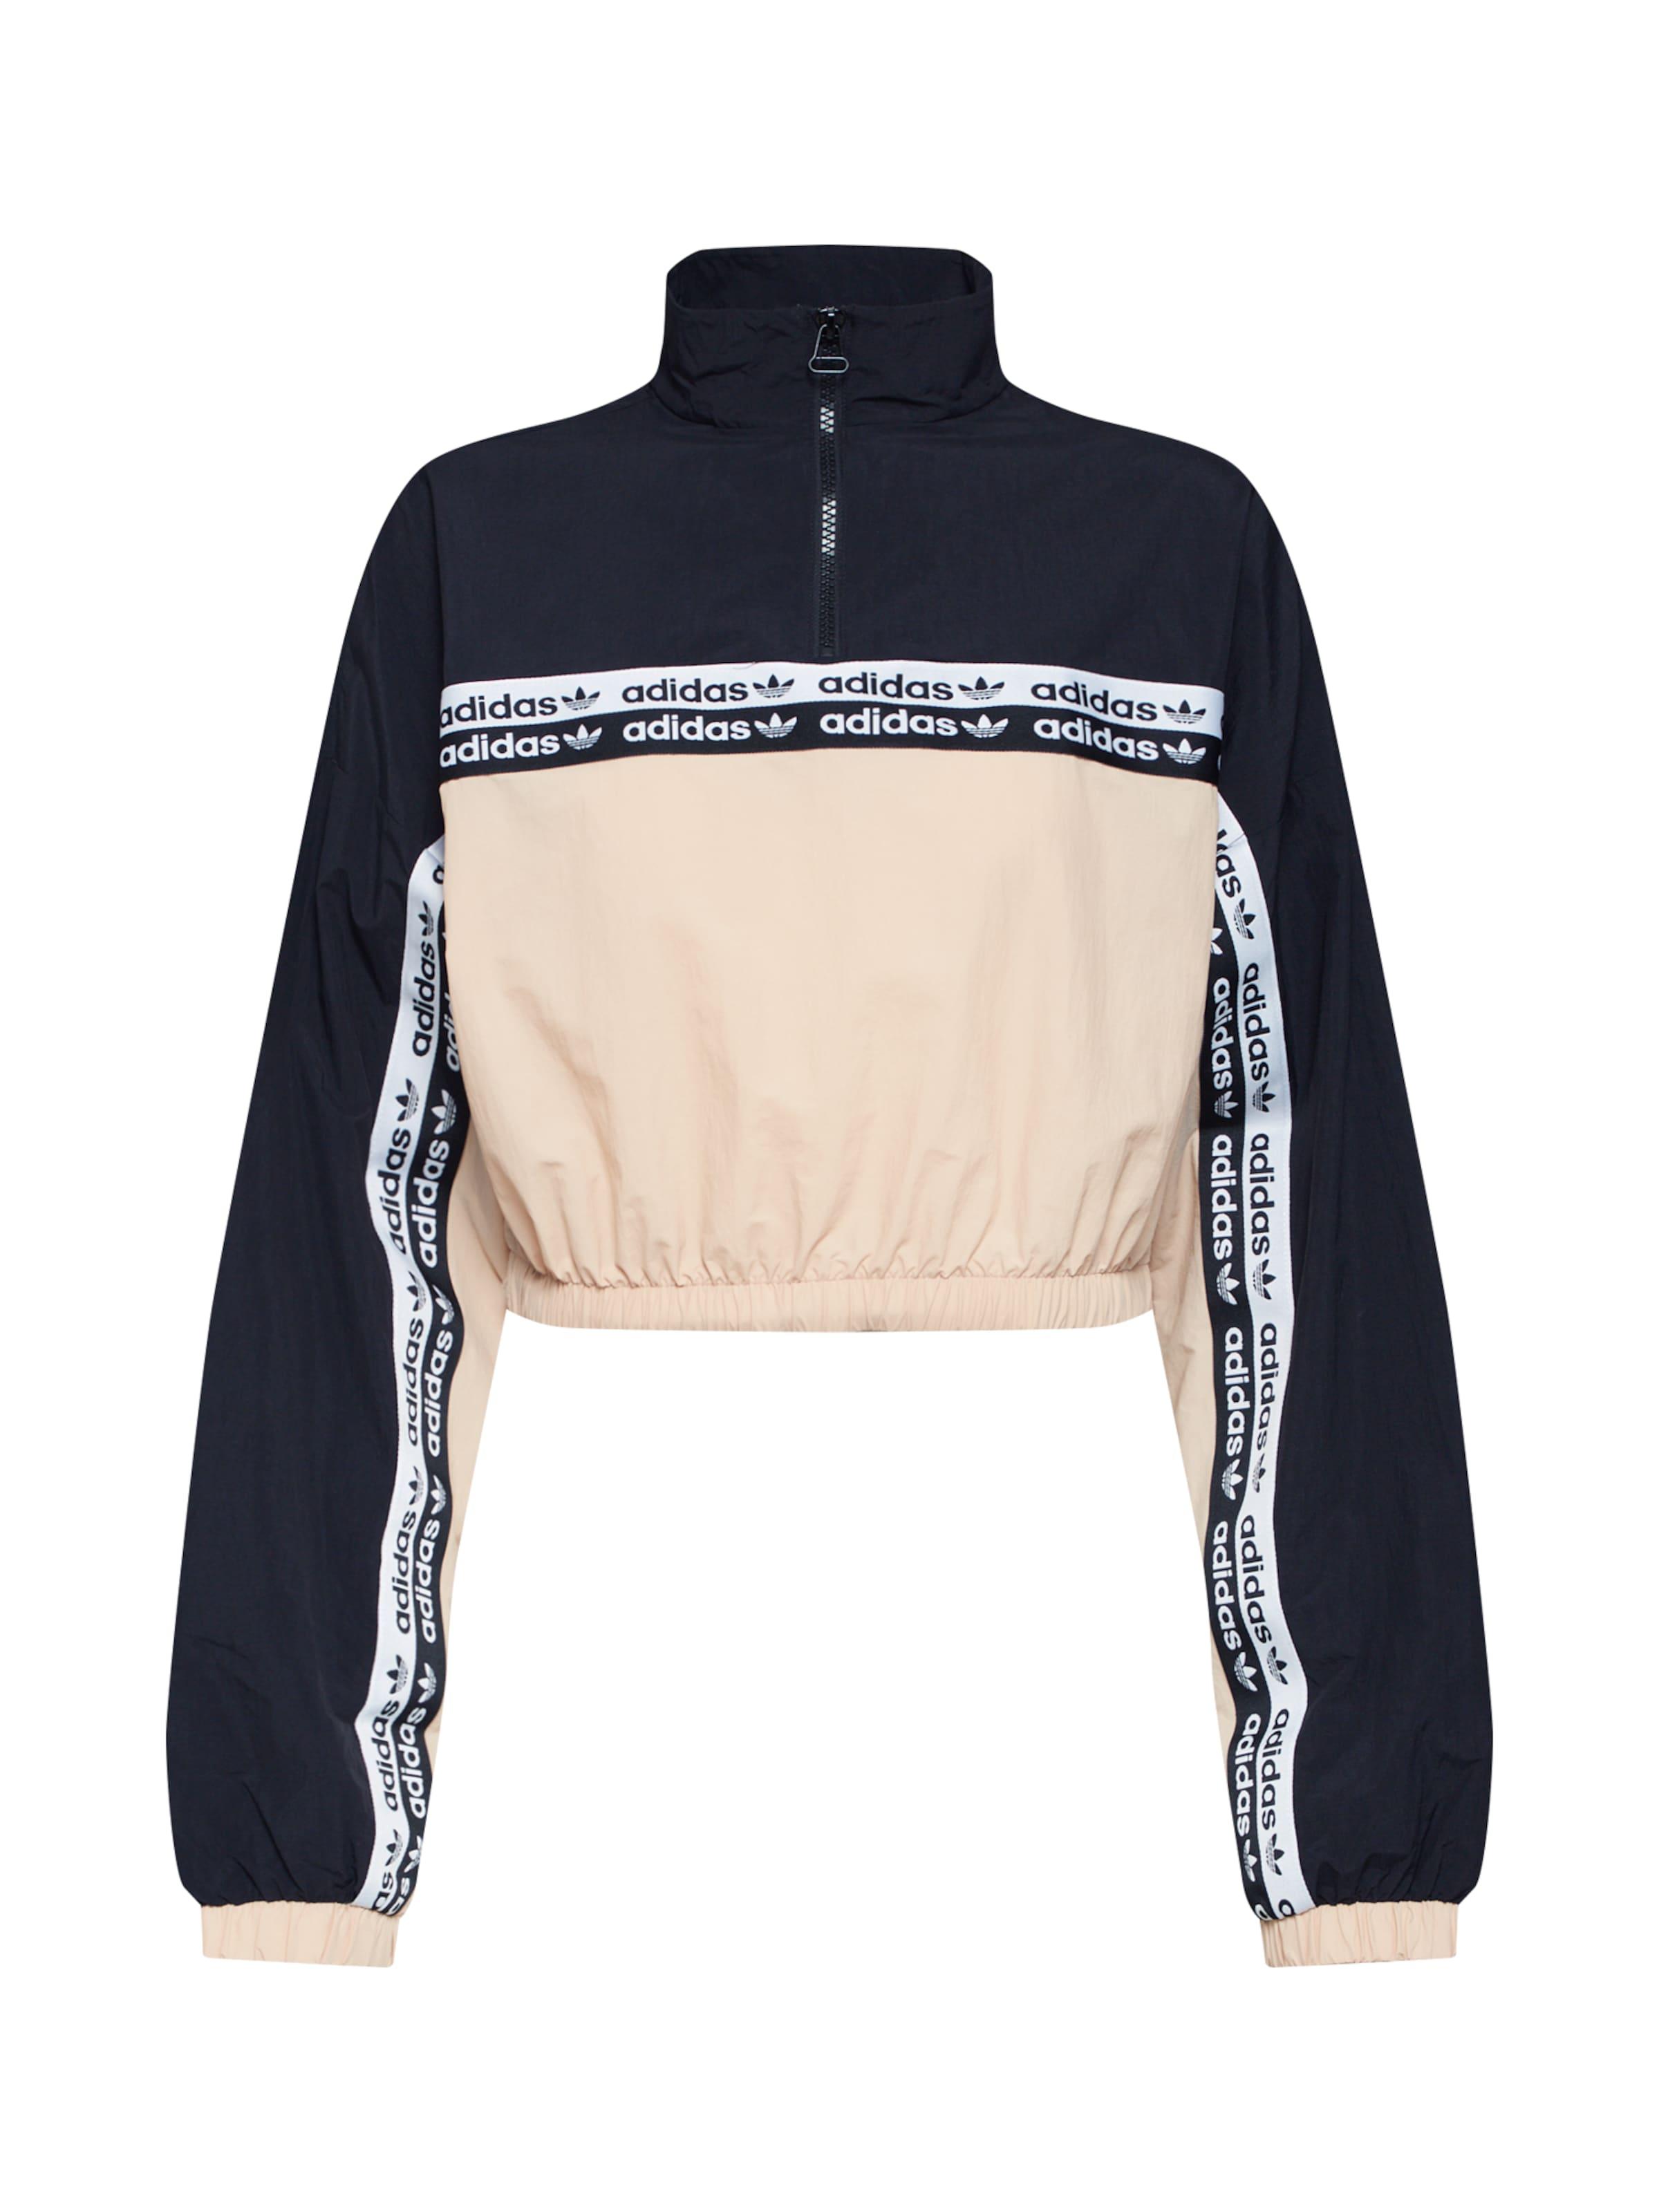 shirt En RoseNoir Adidas Originals Sweat CxdeBo